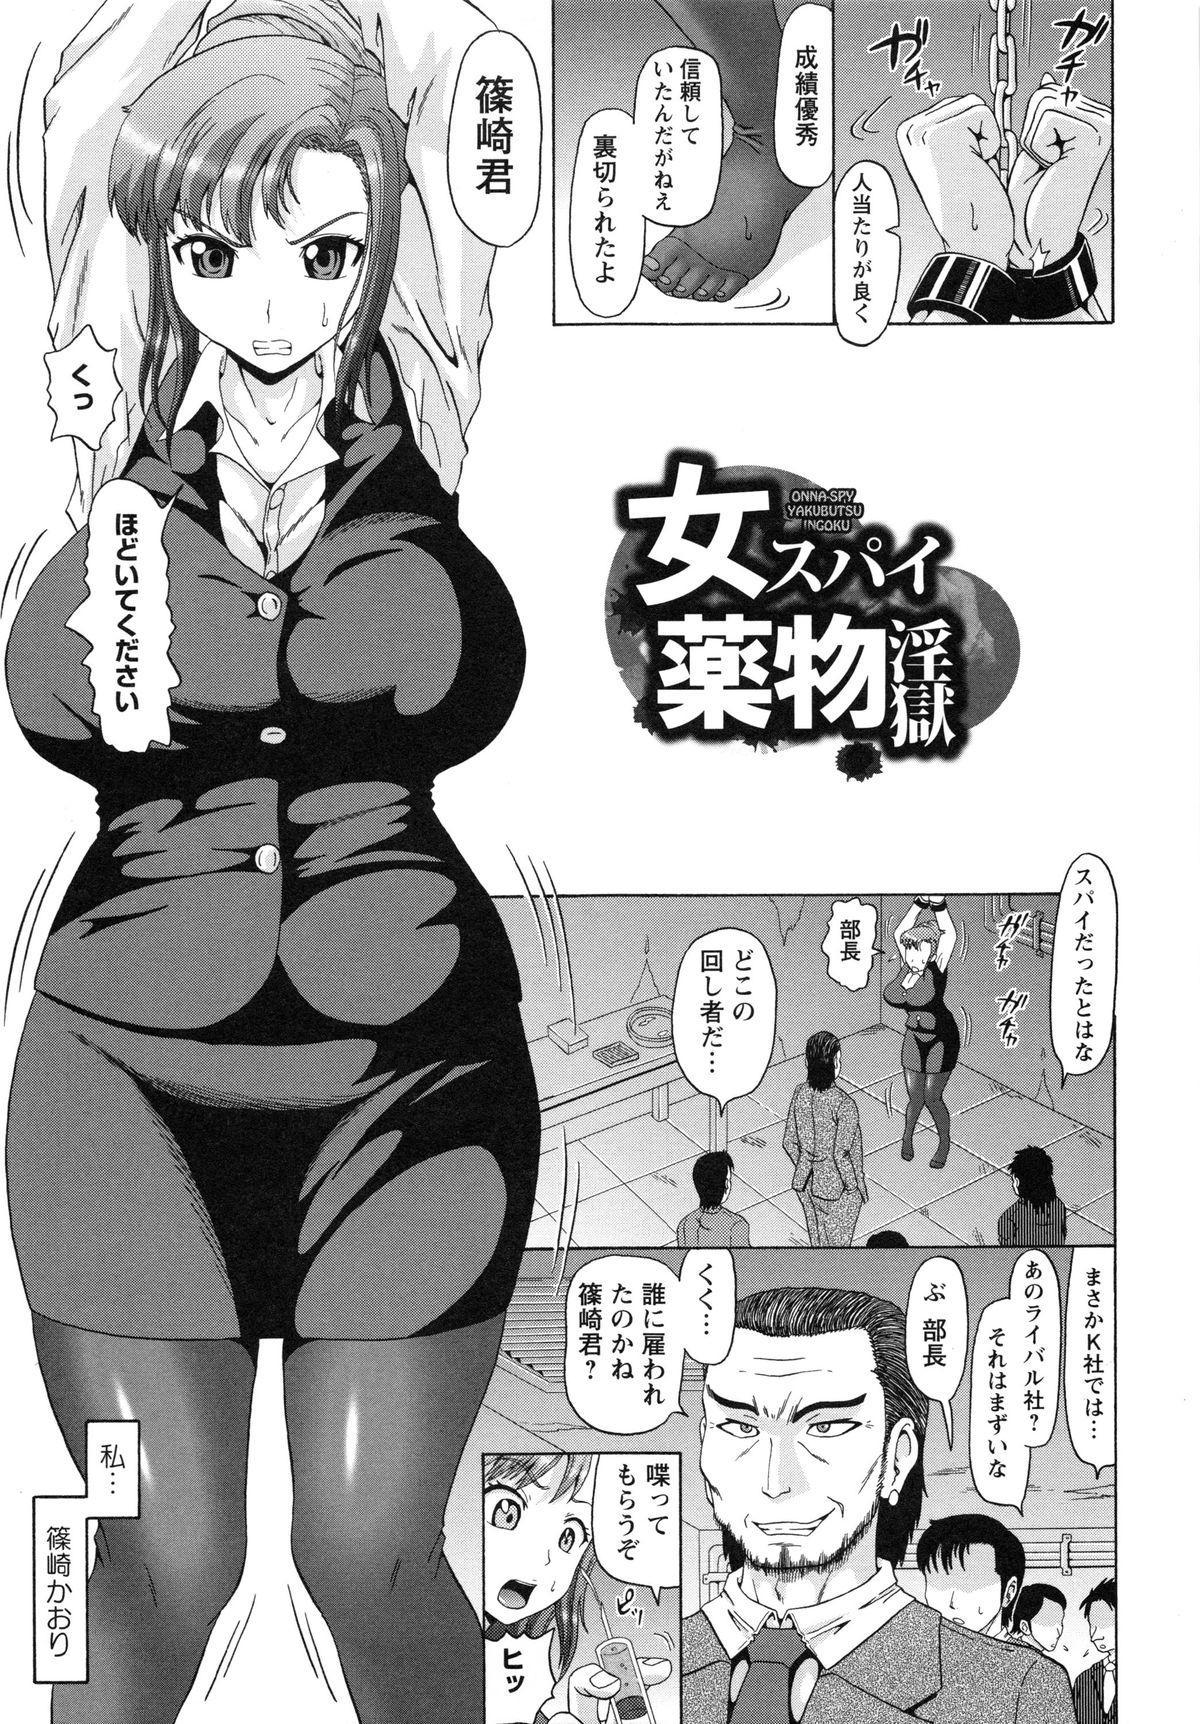 [Nukunuku Orange] Seikou ~Maeana Kanzen Houchi~ - Keep Anus in Anguish!!!! 156